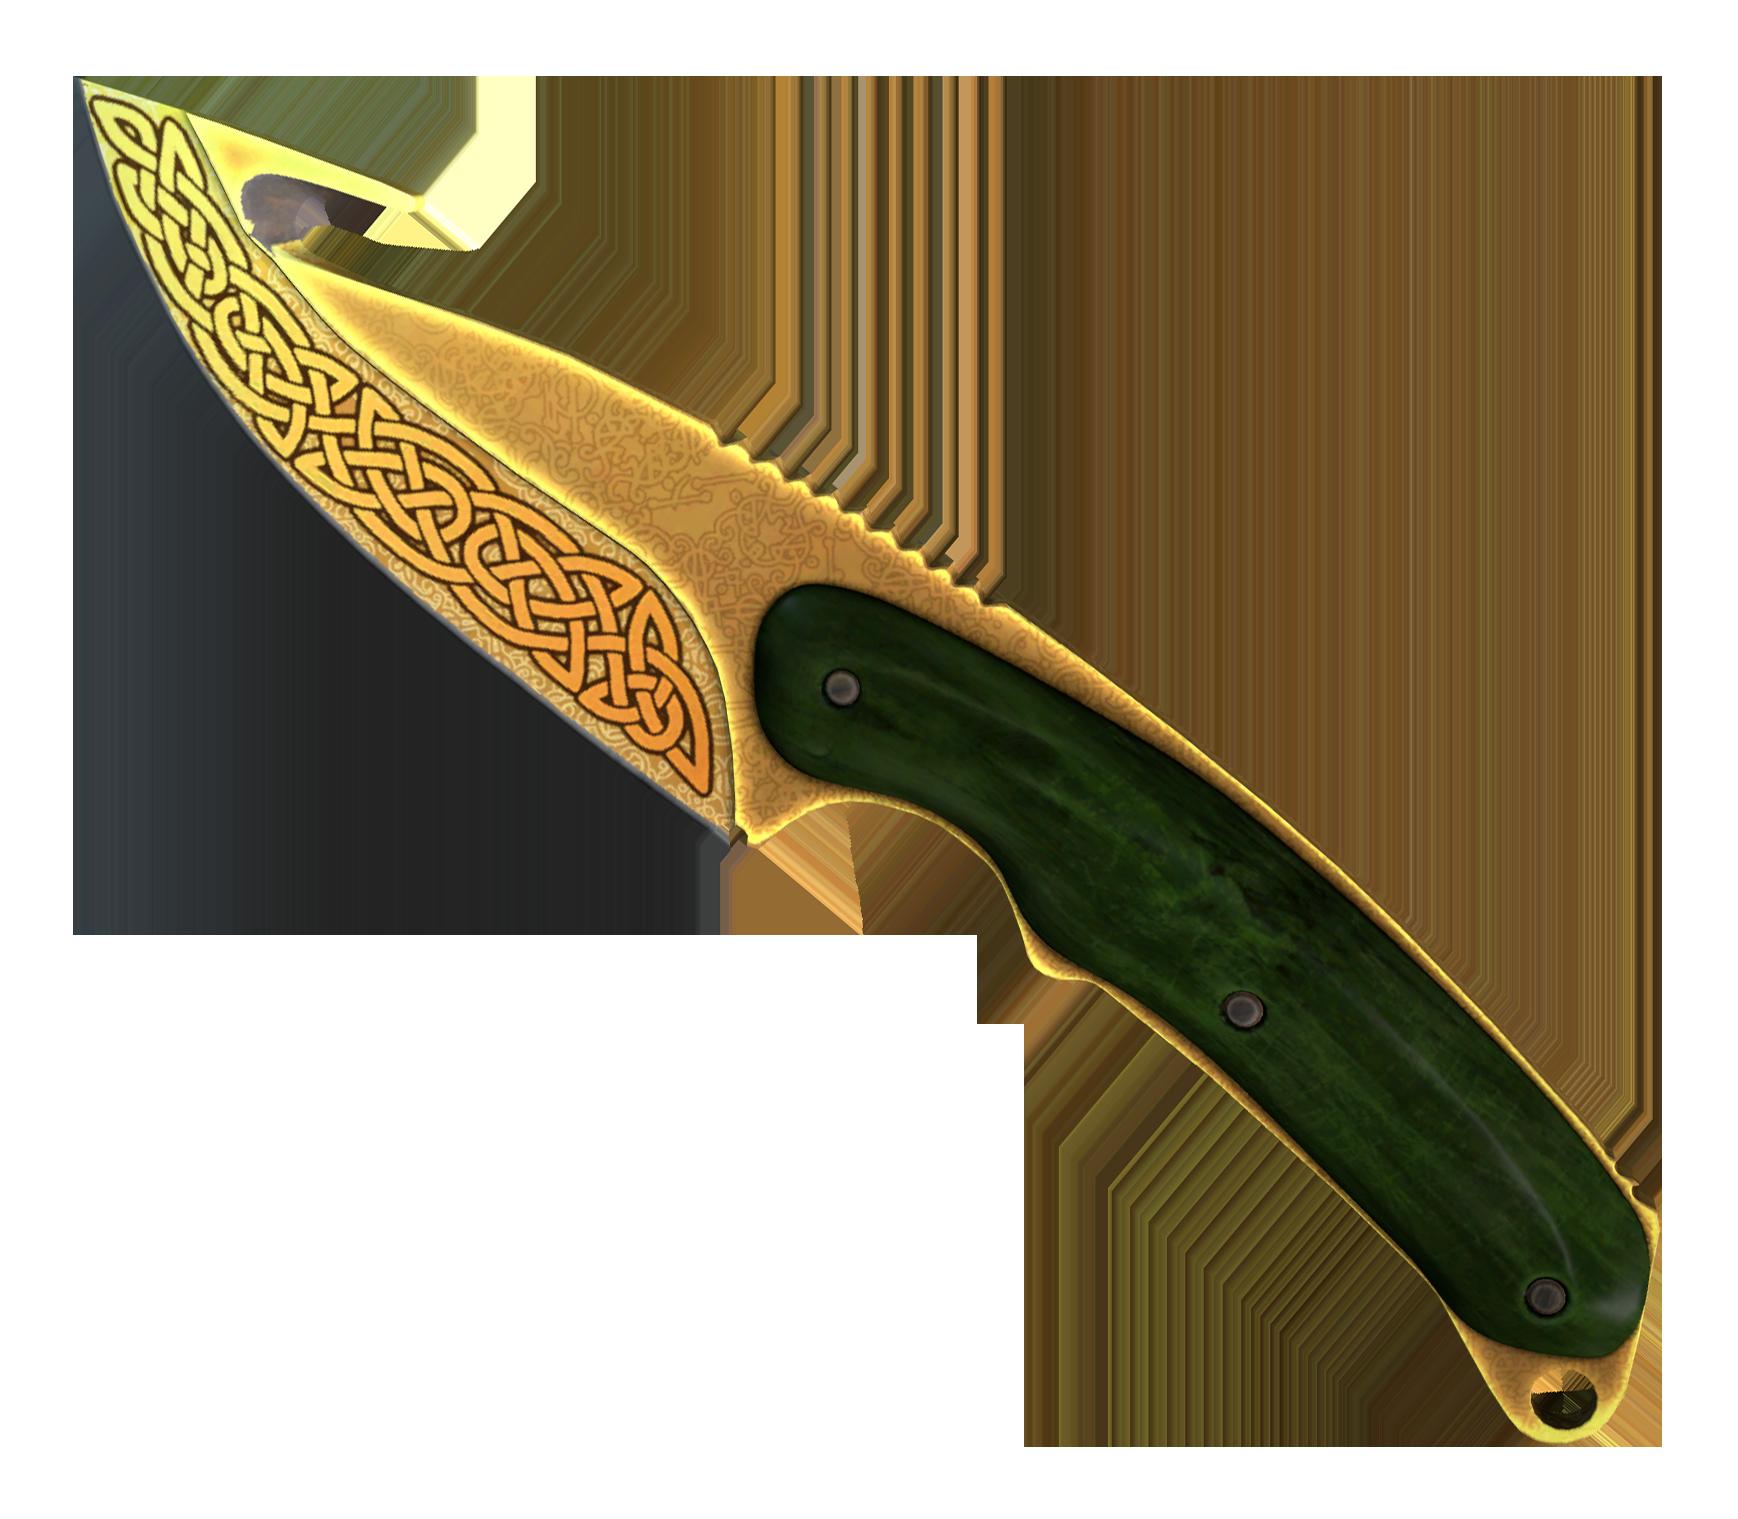 Gut Knife Lore Large Rendering